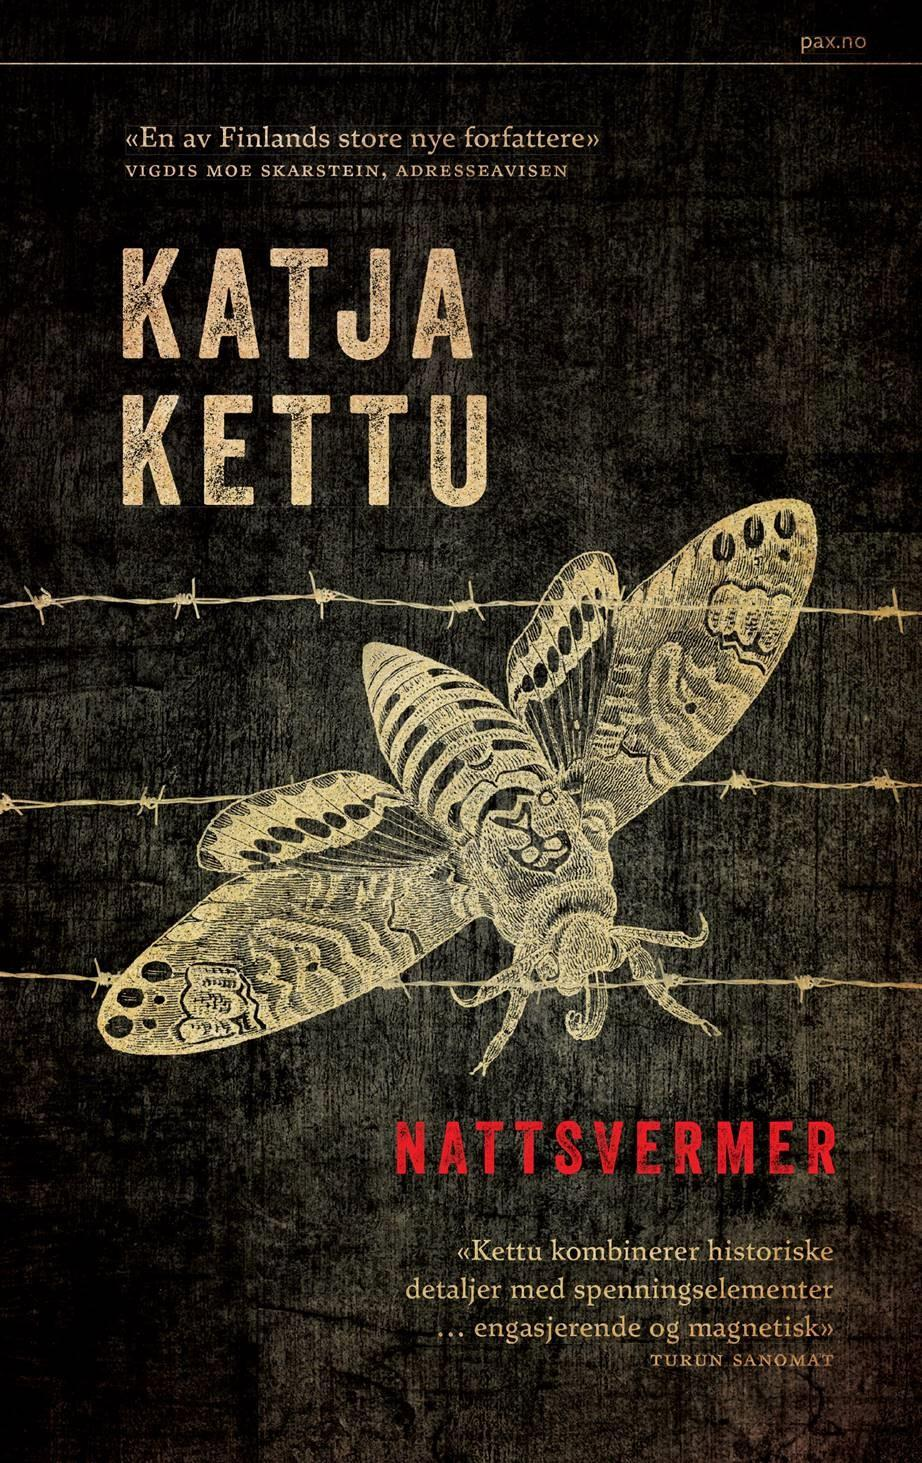 """Nattsvermer"" av Katja Kettu"